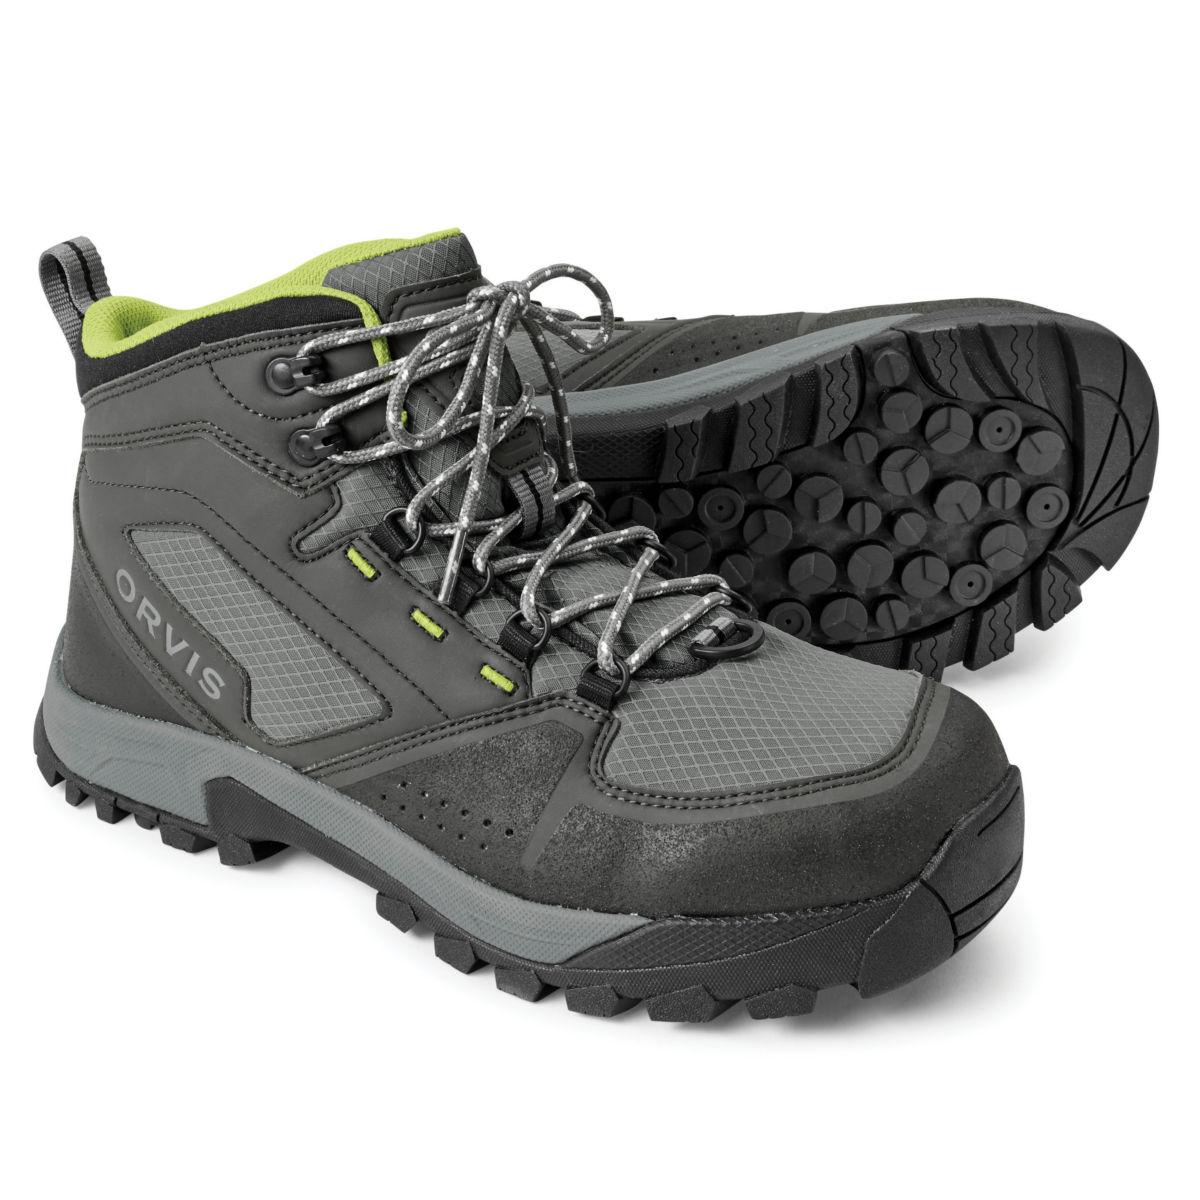 Men's Ultralight Wading Boot - COBBLESTONE/CITRONimage number 0